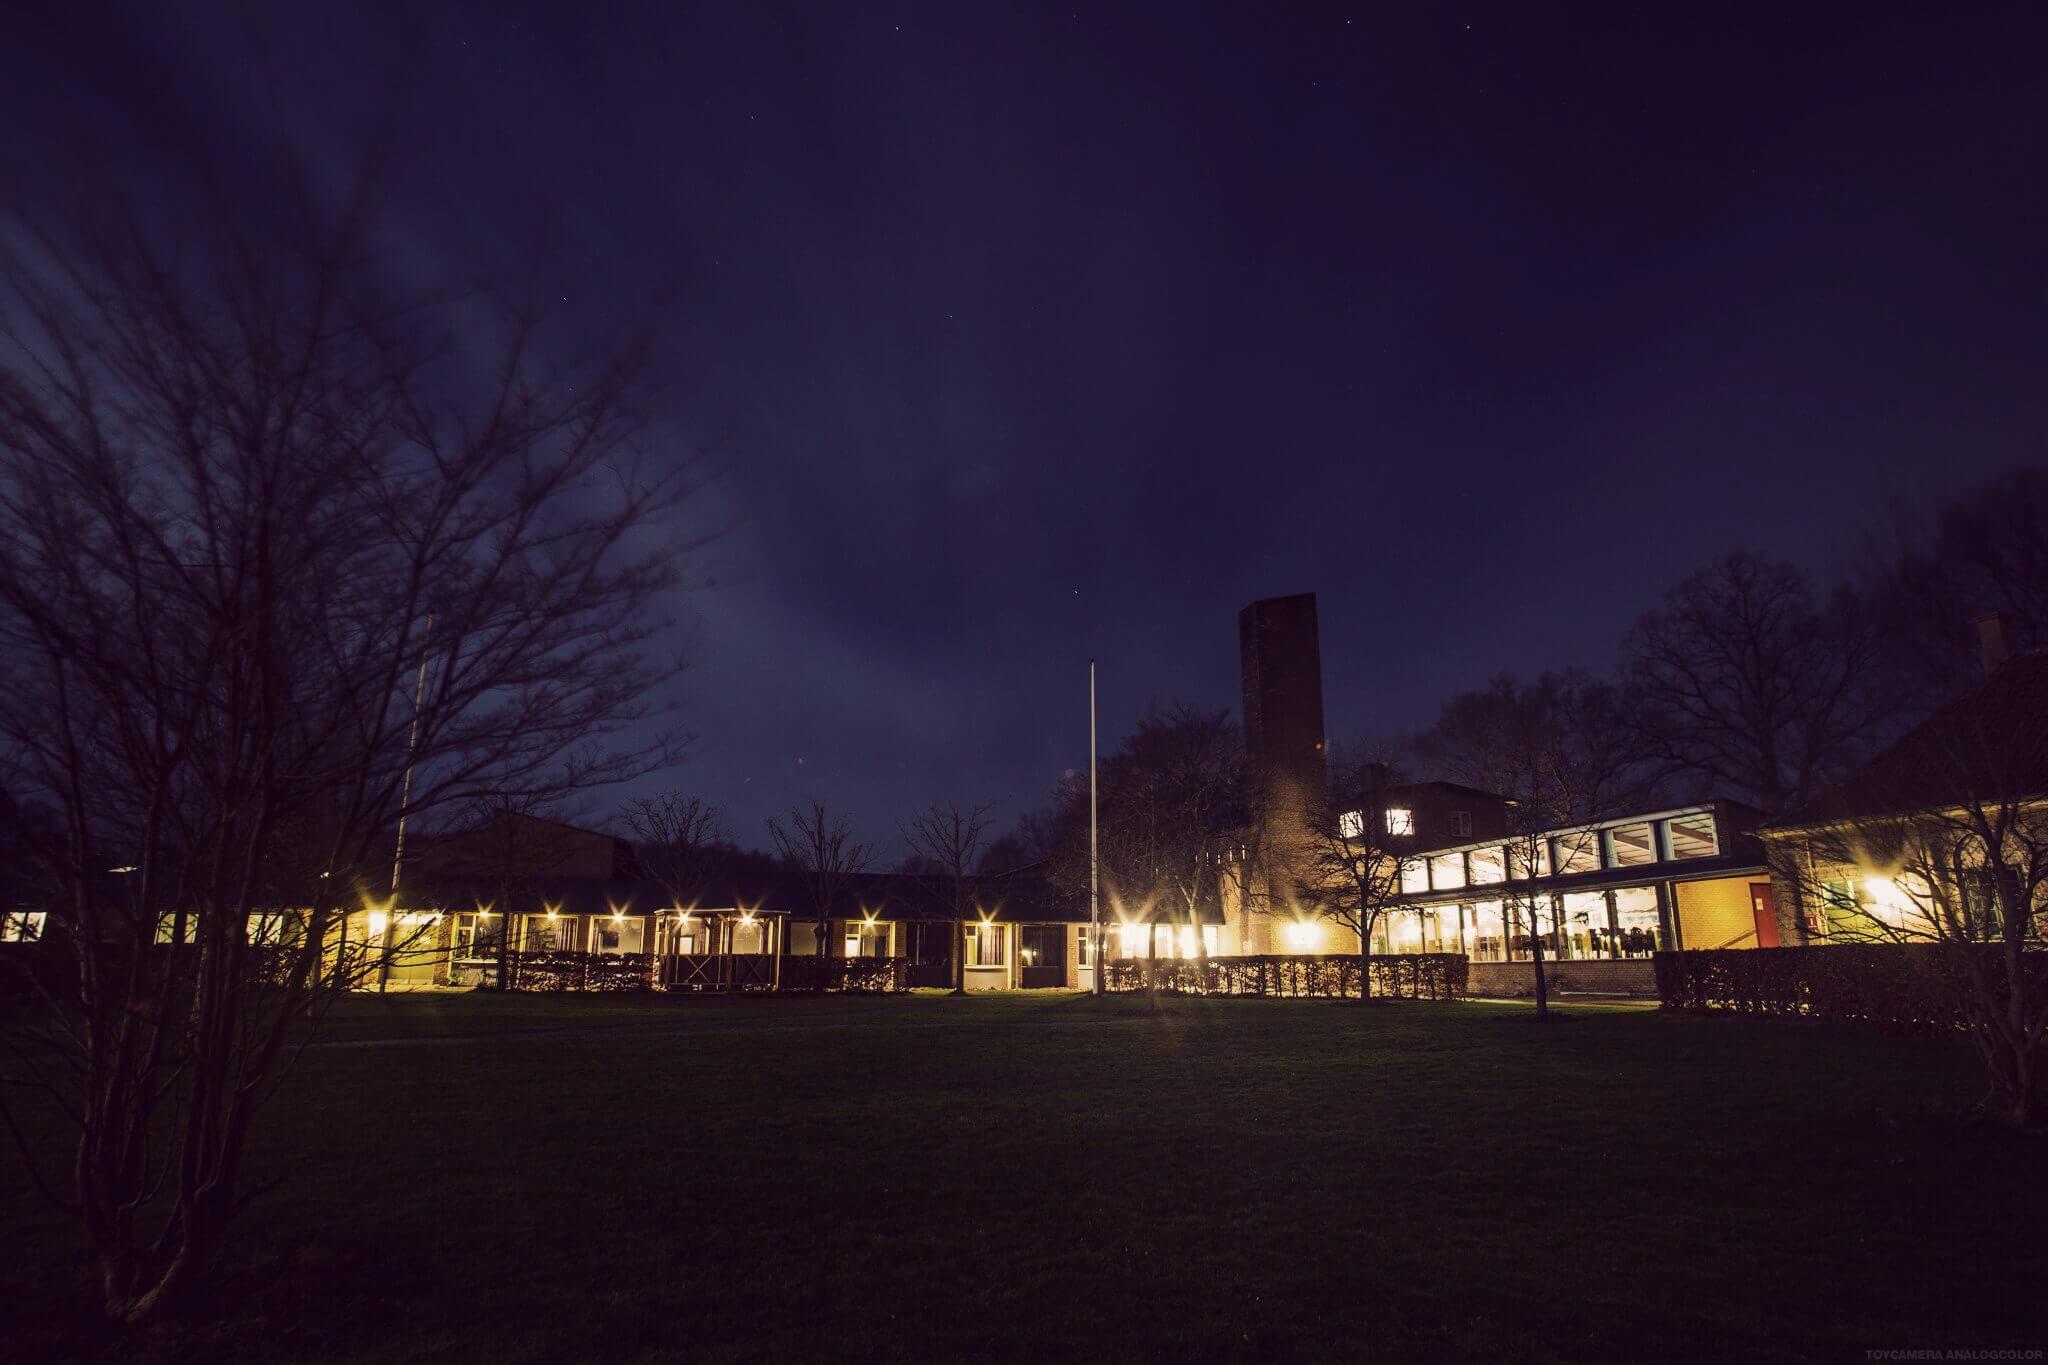 International People's College facilities at night - a folk high school in Denmark